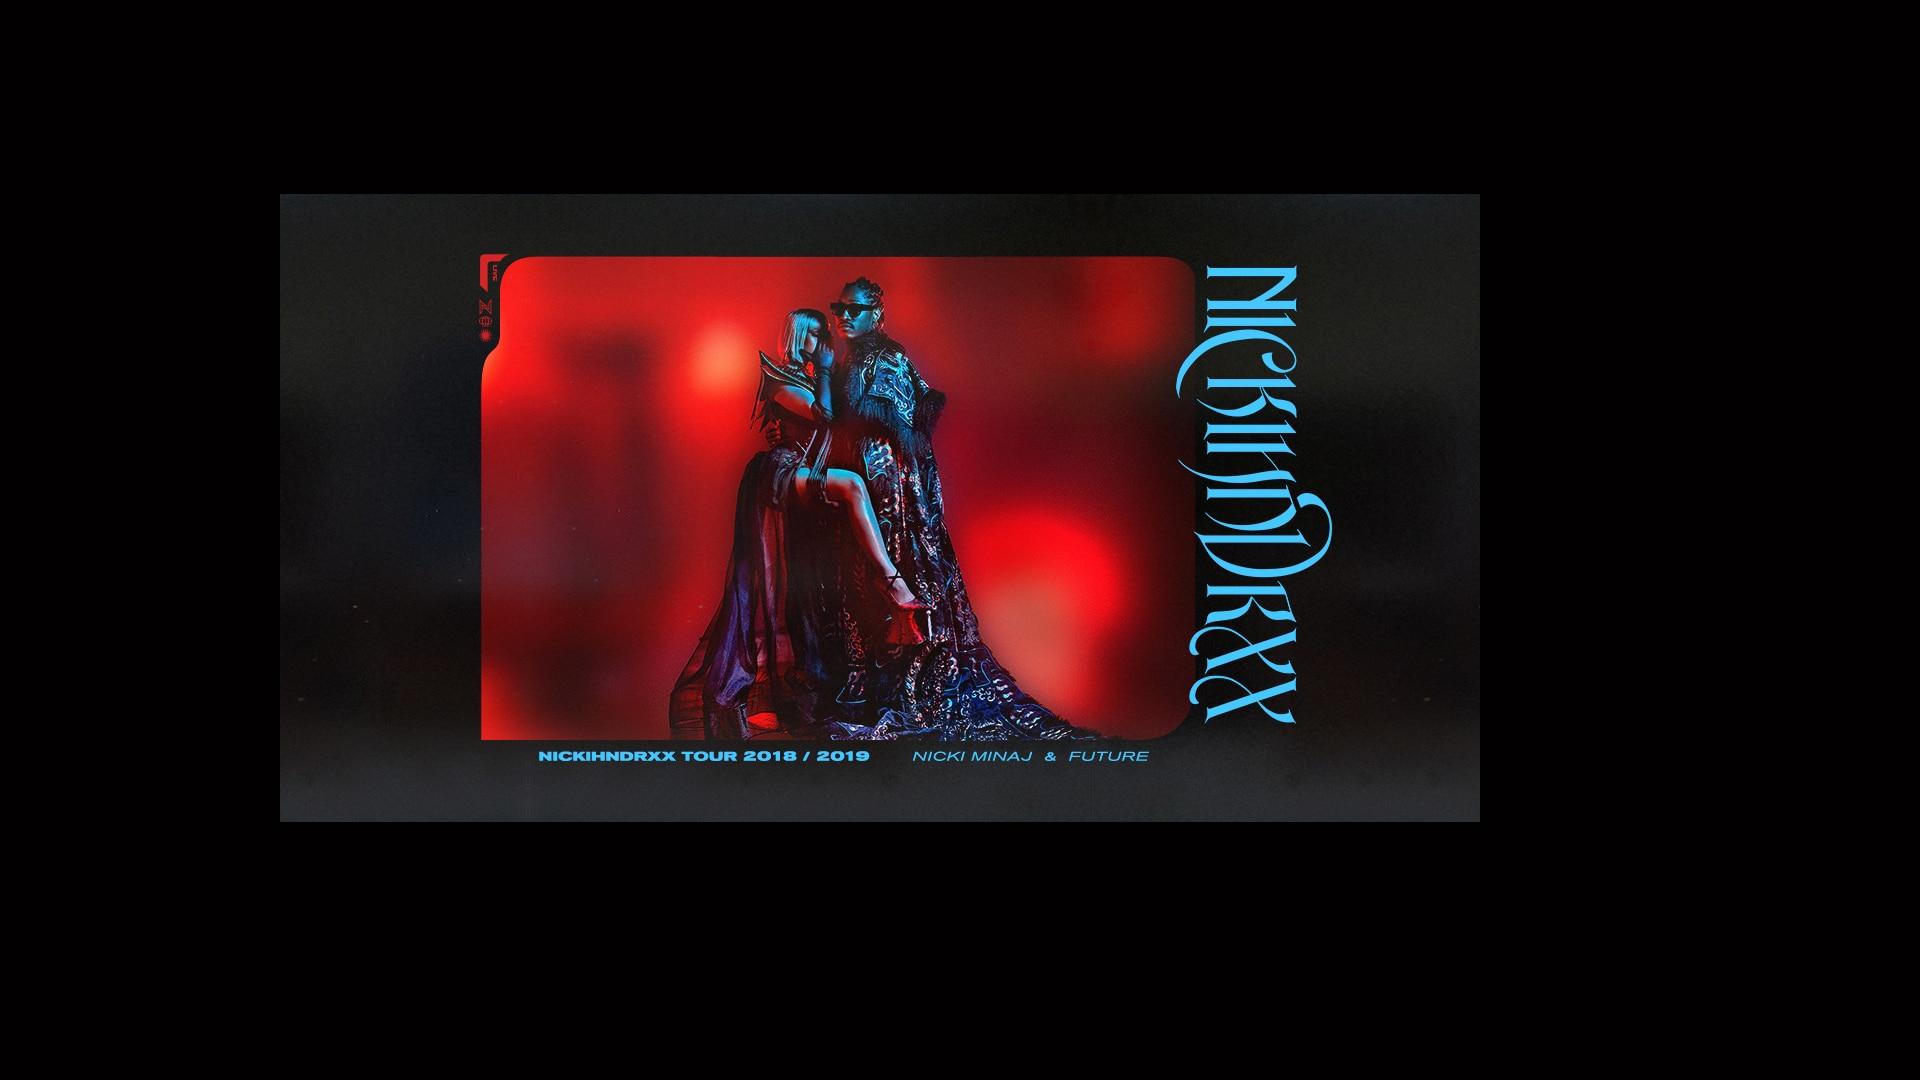 NICKIHNDRXX TOUR - New Date!